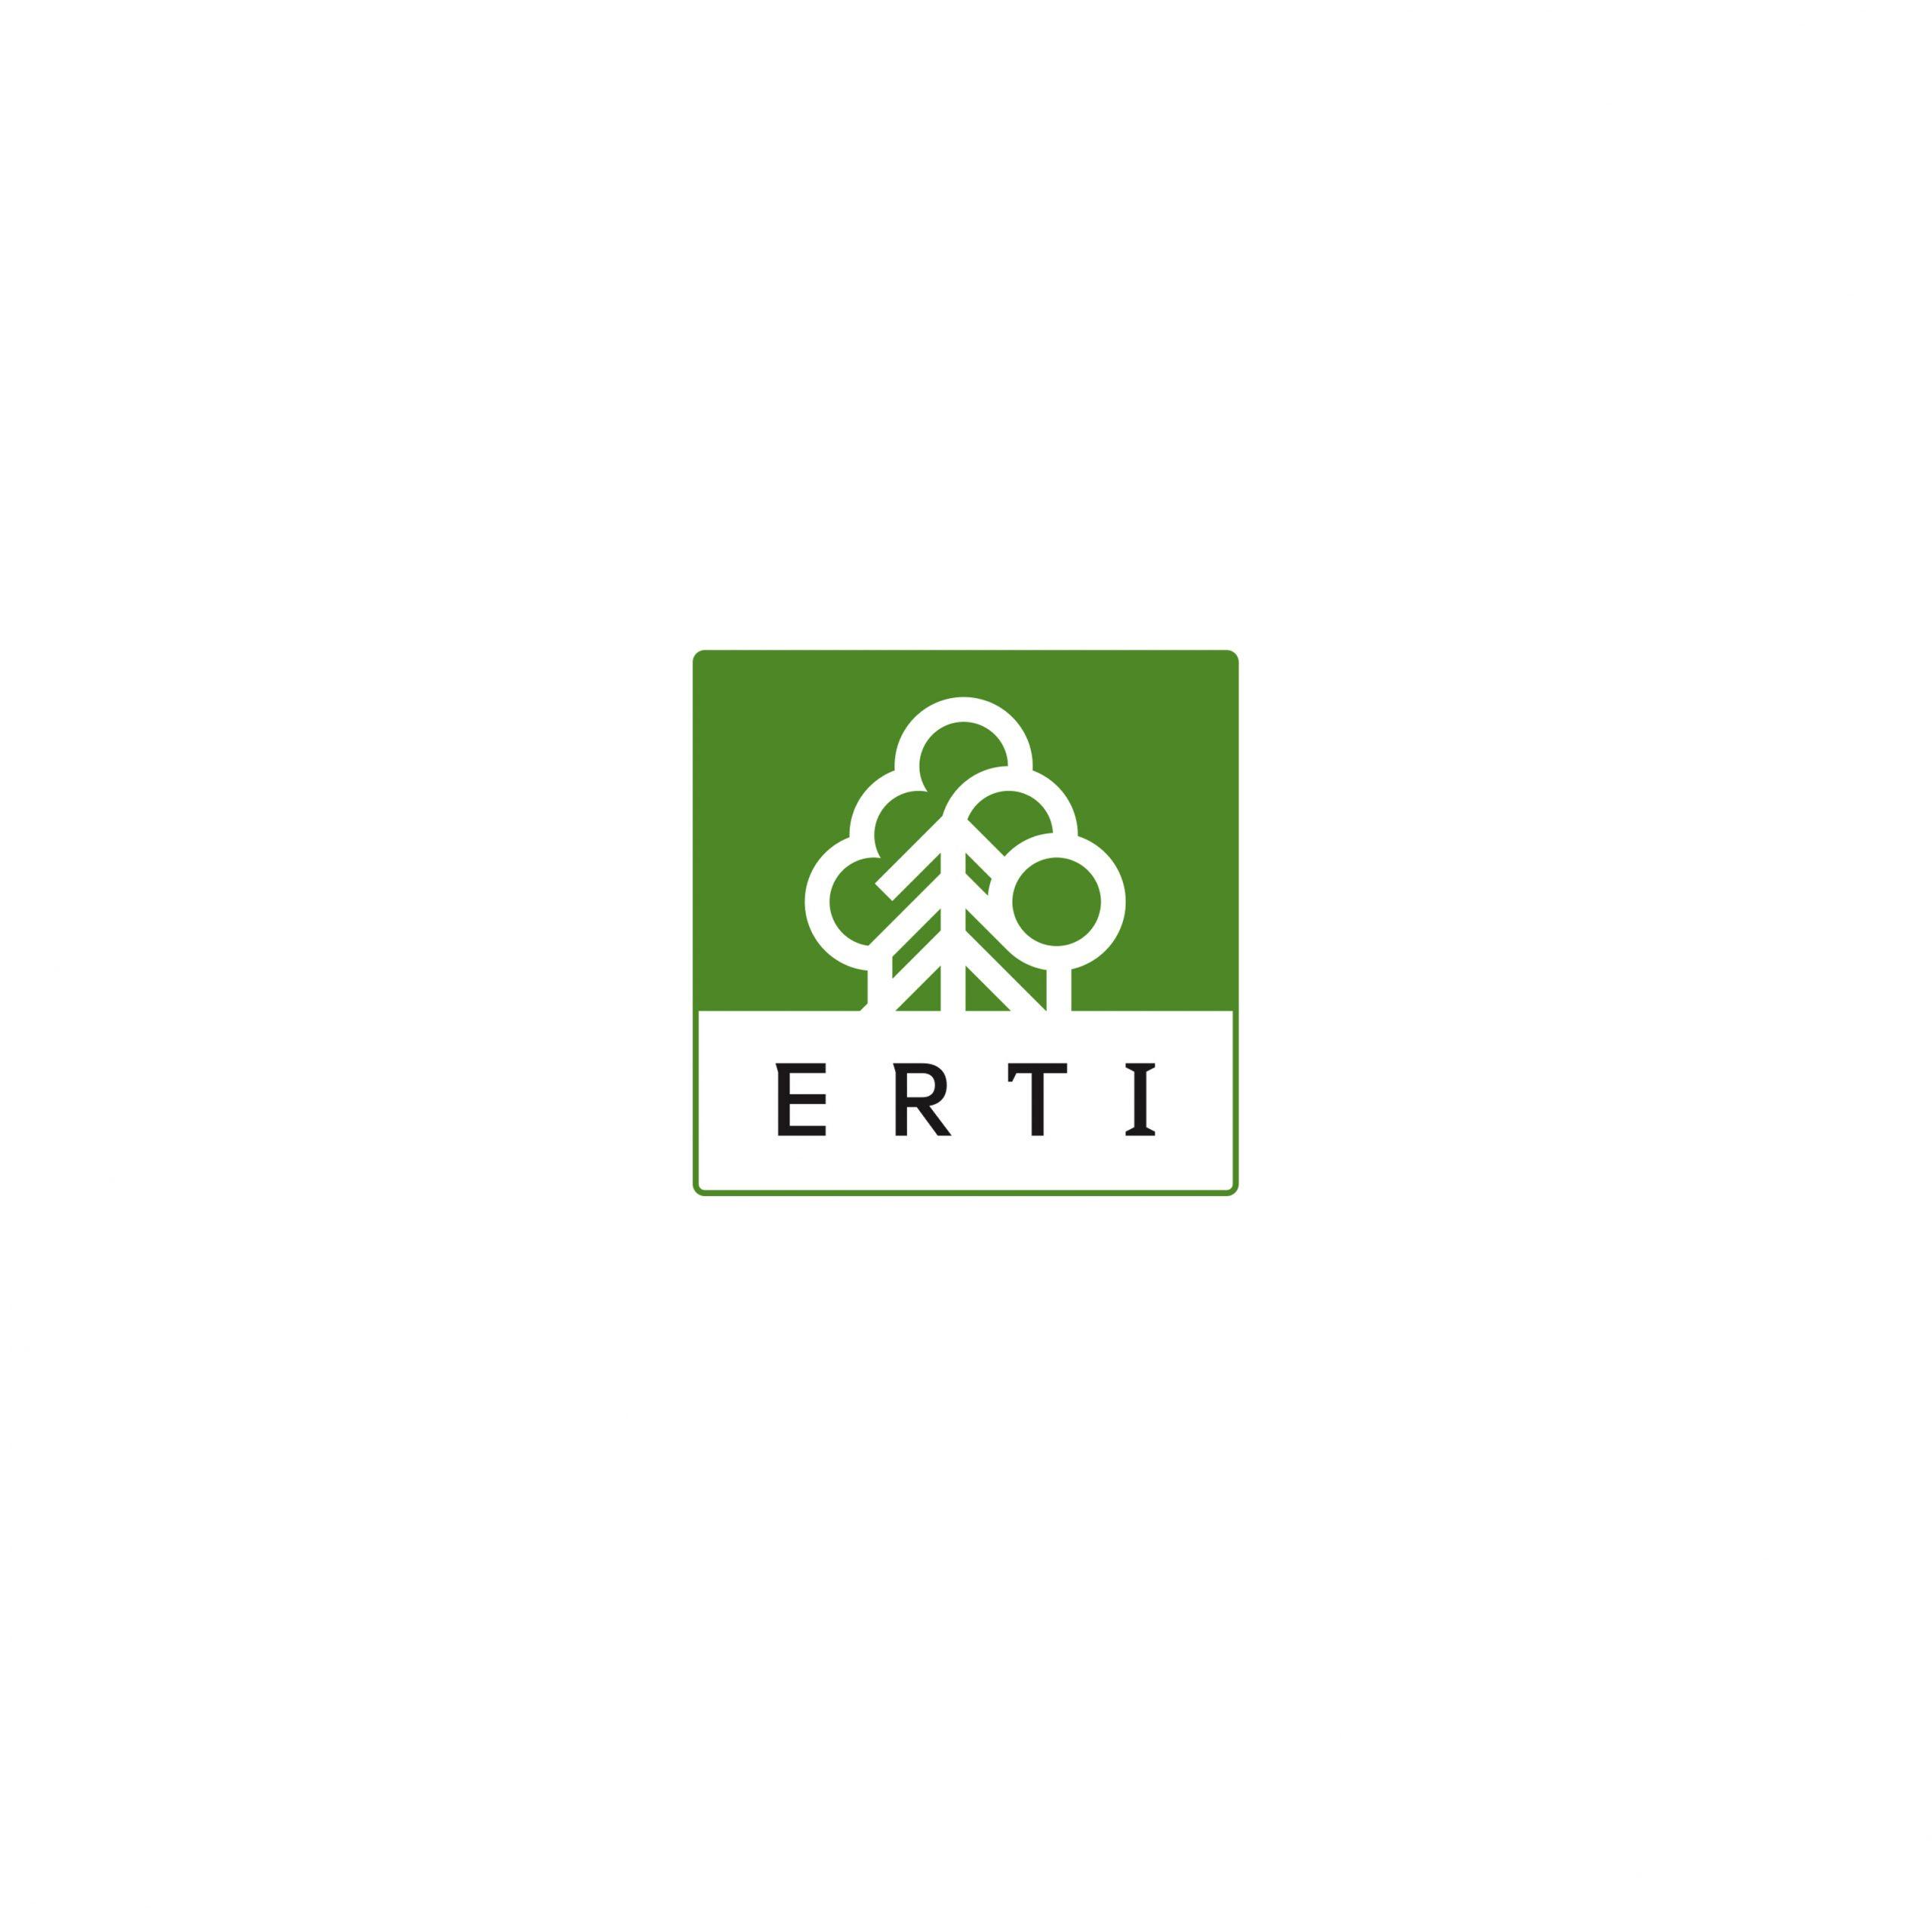 ERTI logo